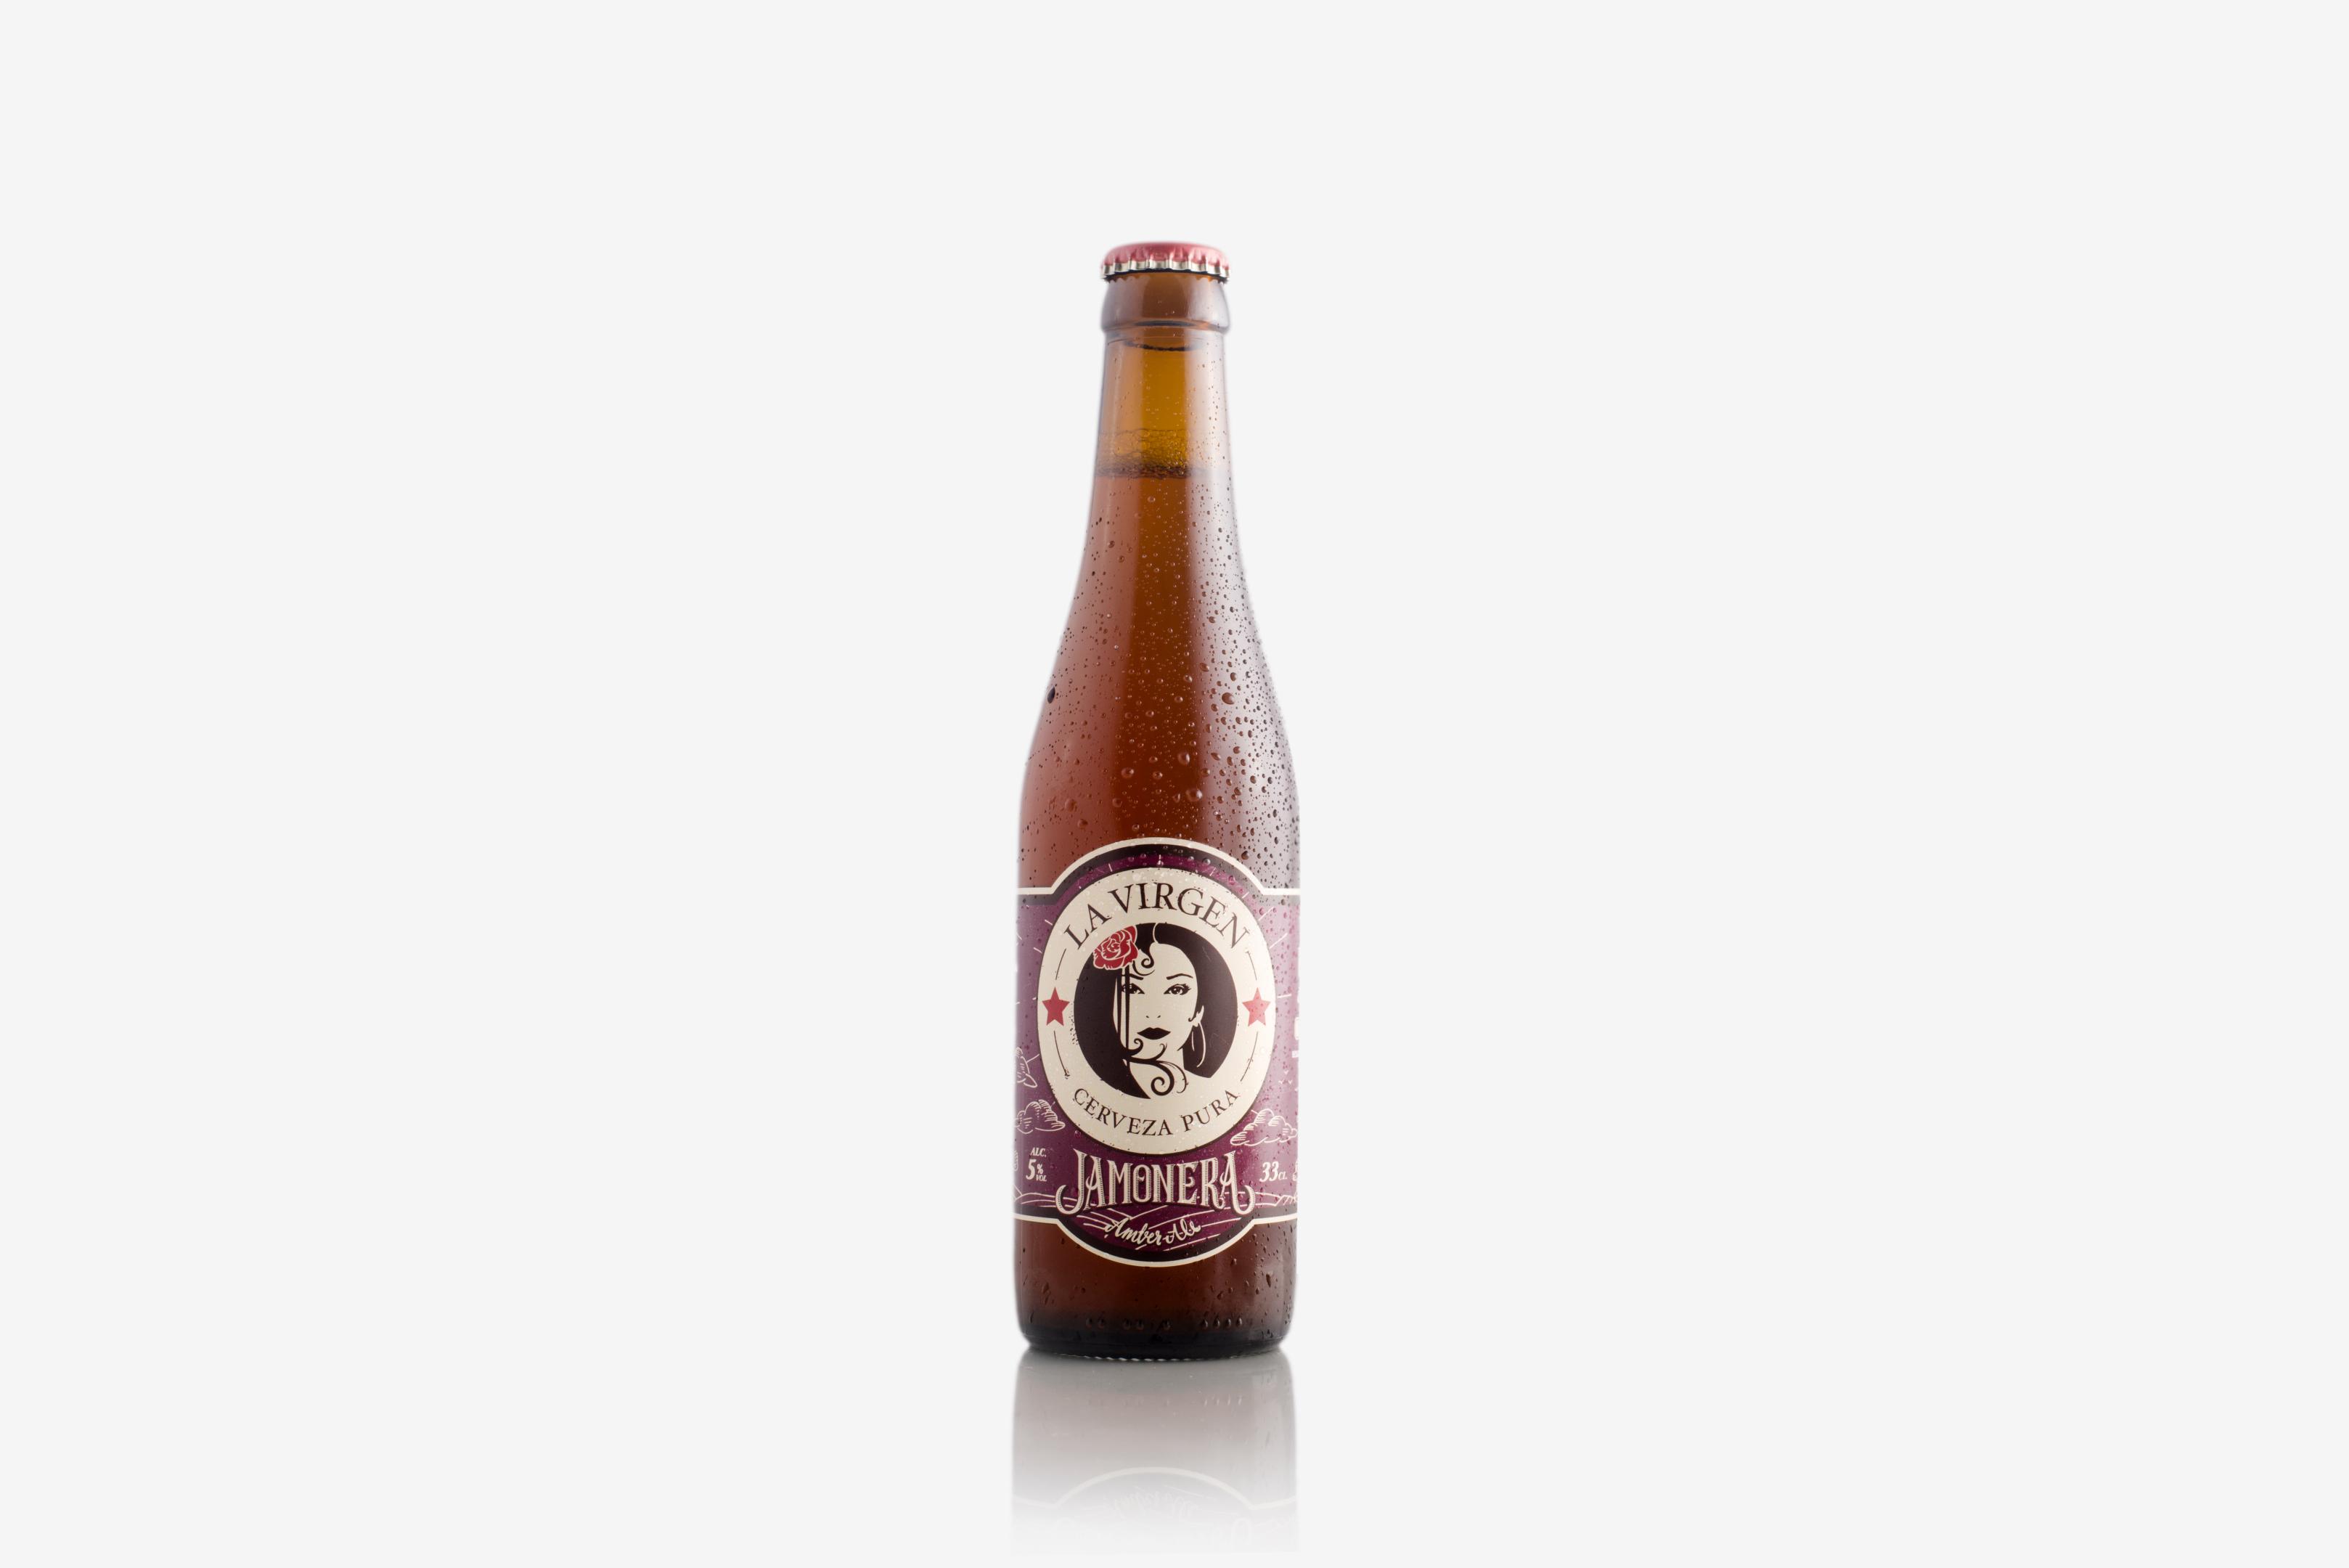 Cerveza: Virgen Jamonera